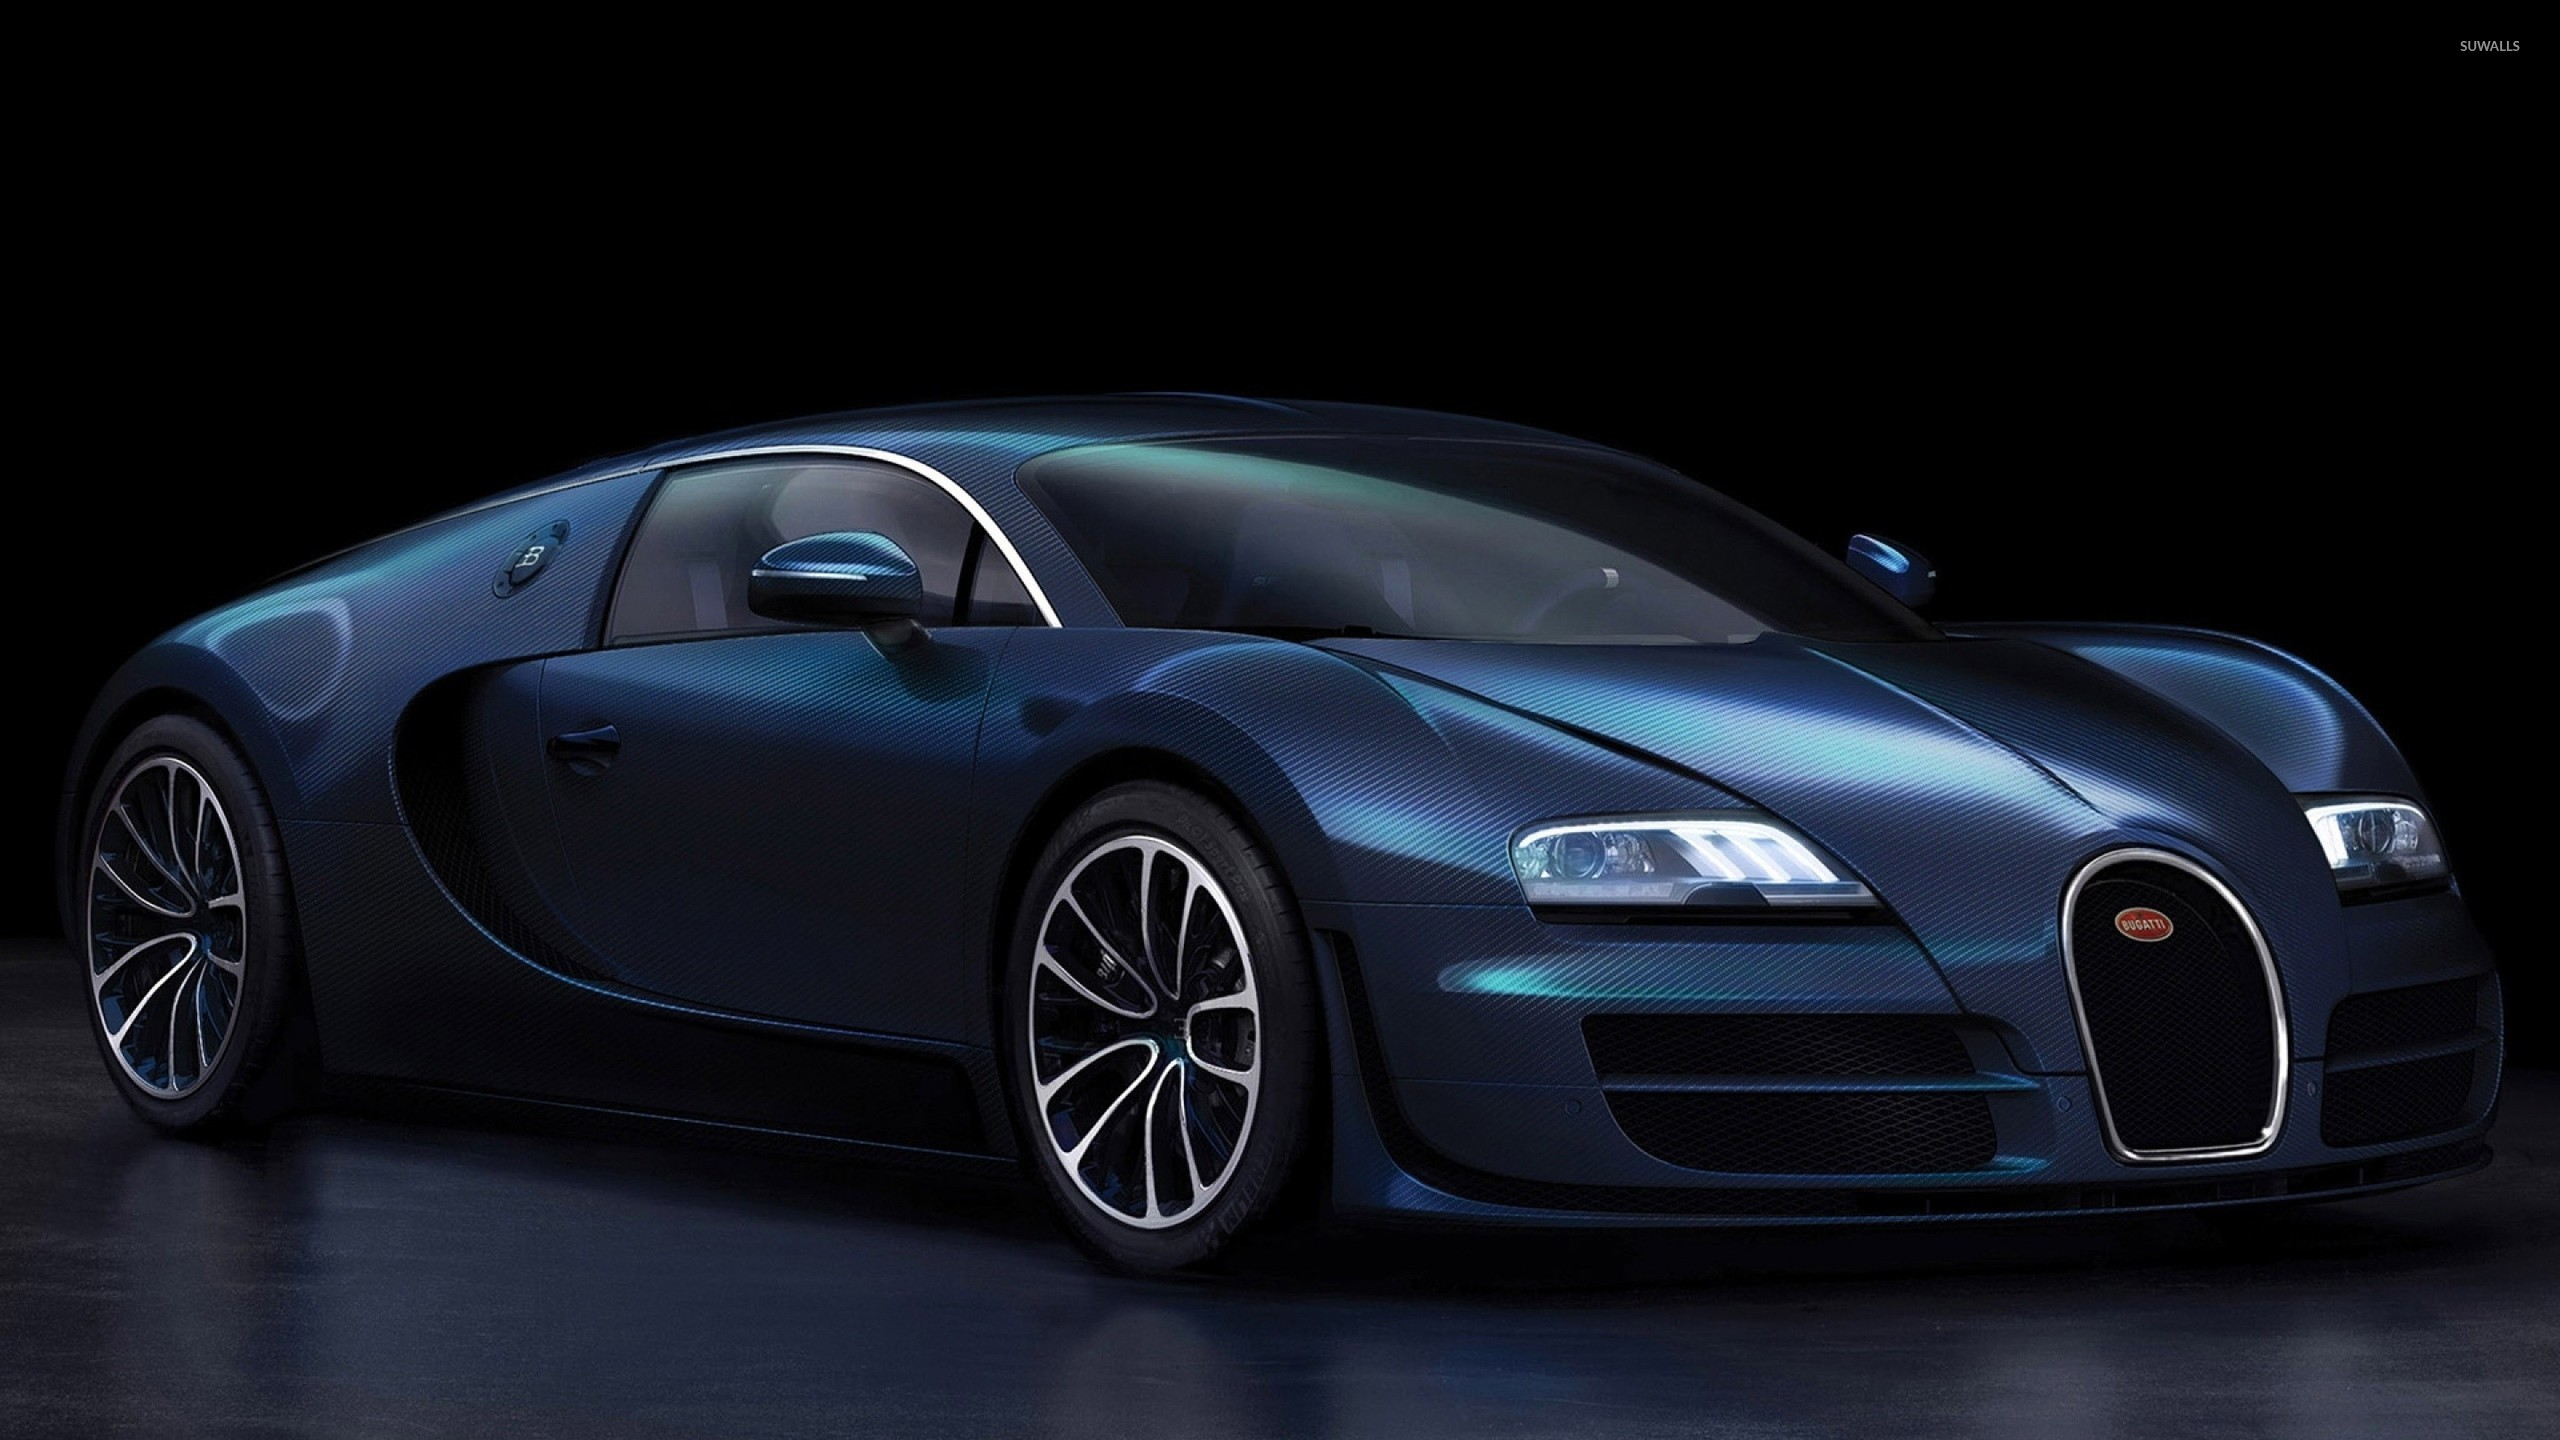 dark blue bugatti veyron front side view wallpaper car wallpapers 50143. Black Bedroom Furniture Sets. Home Design Ideas